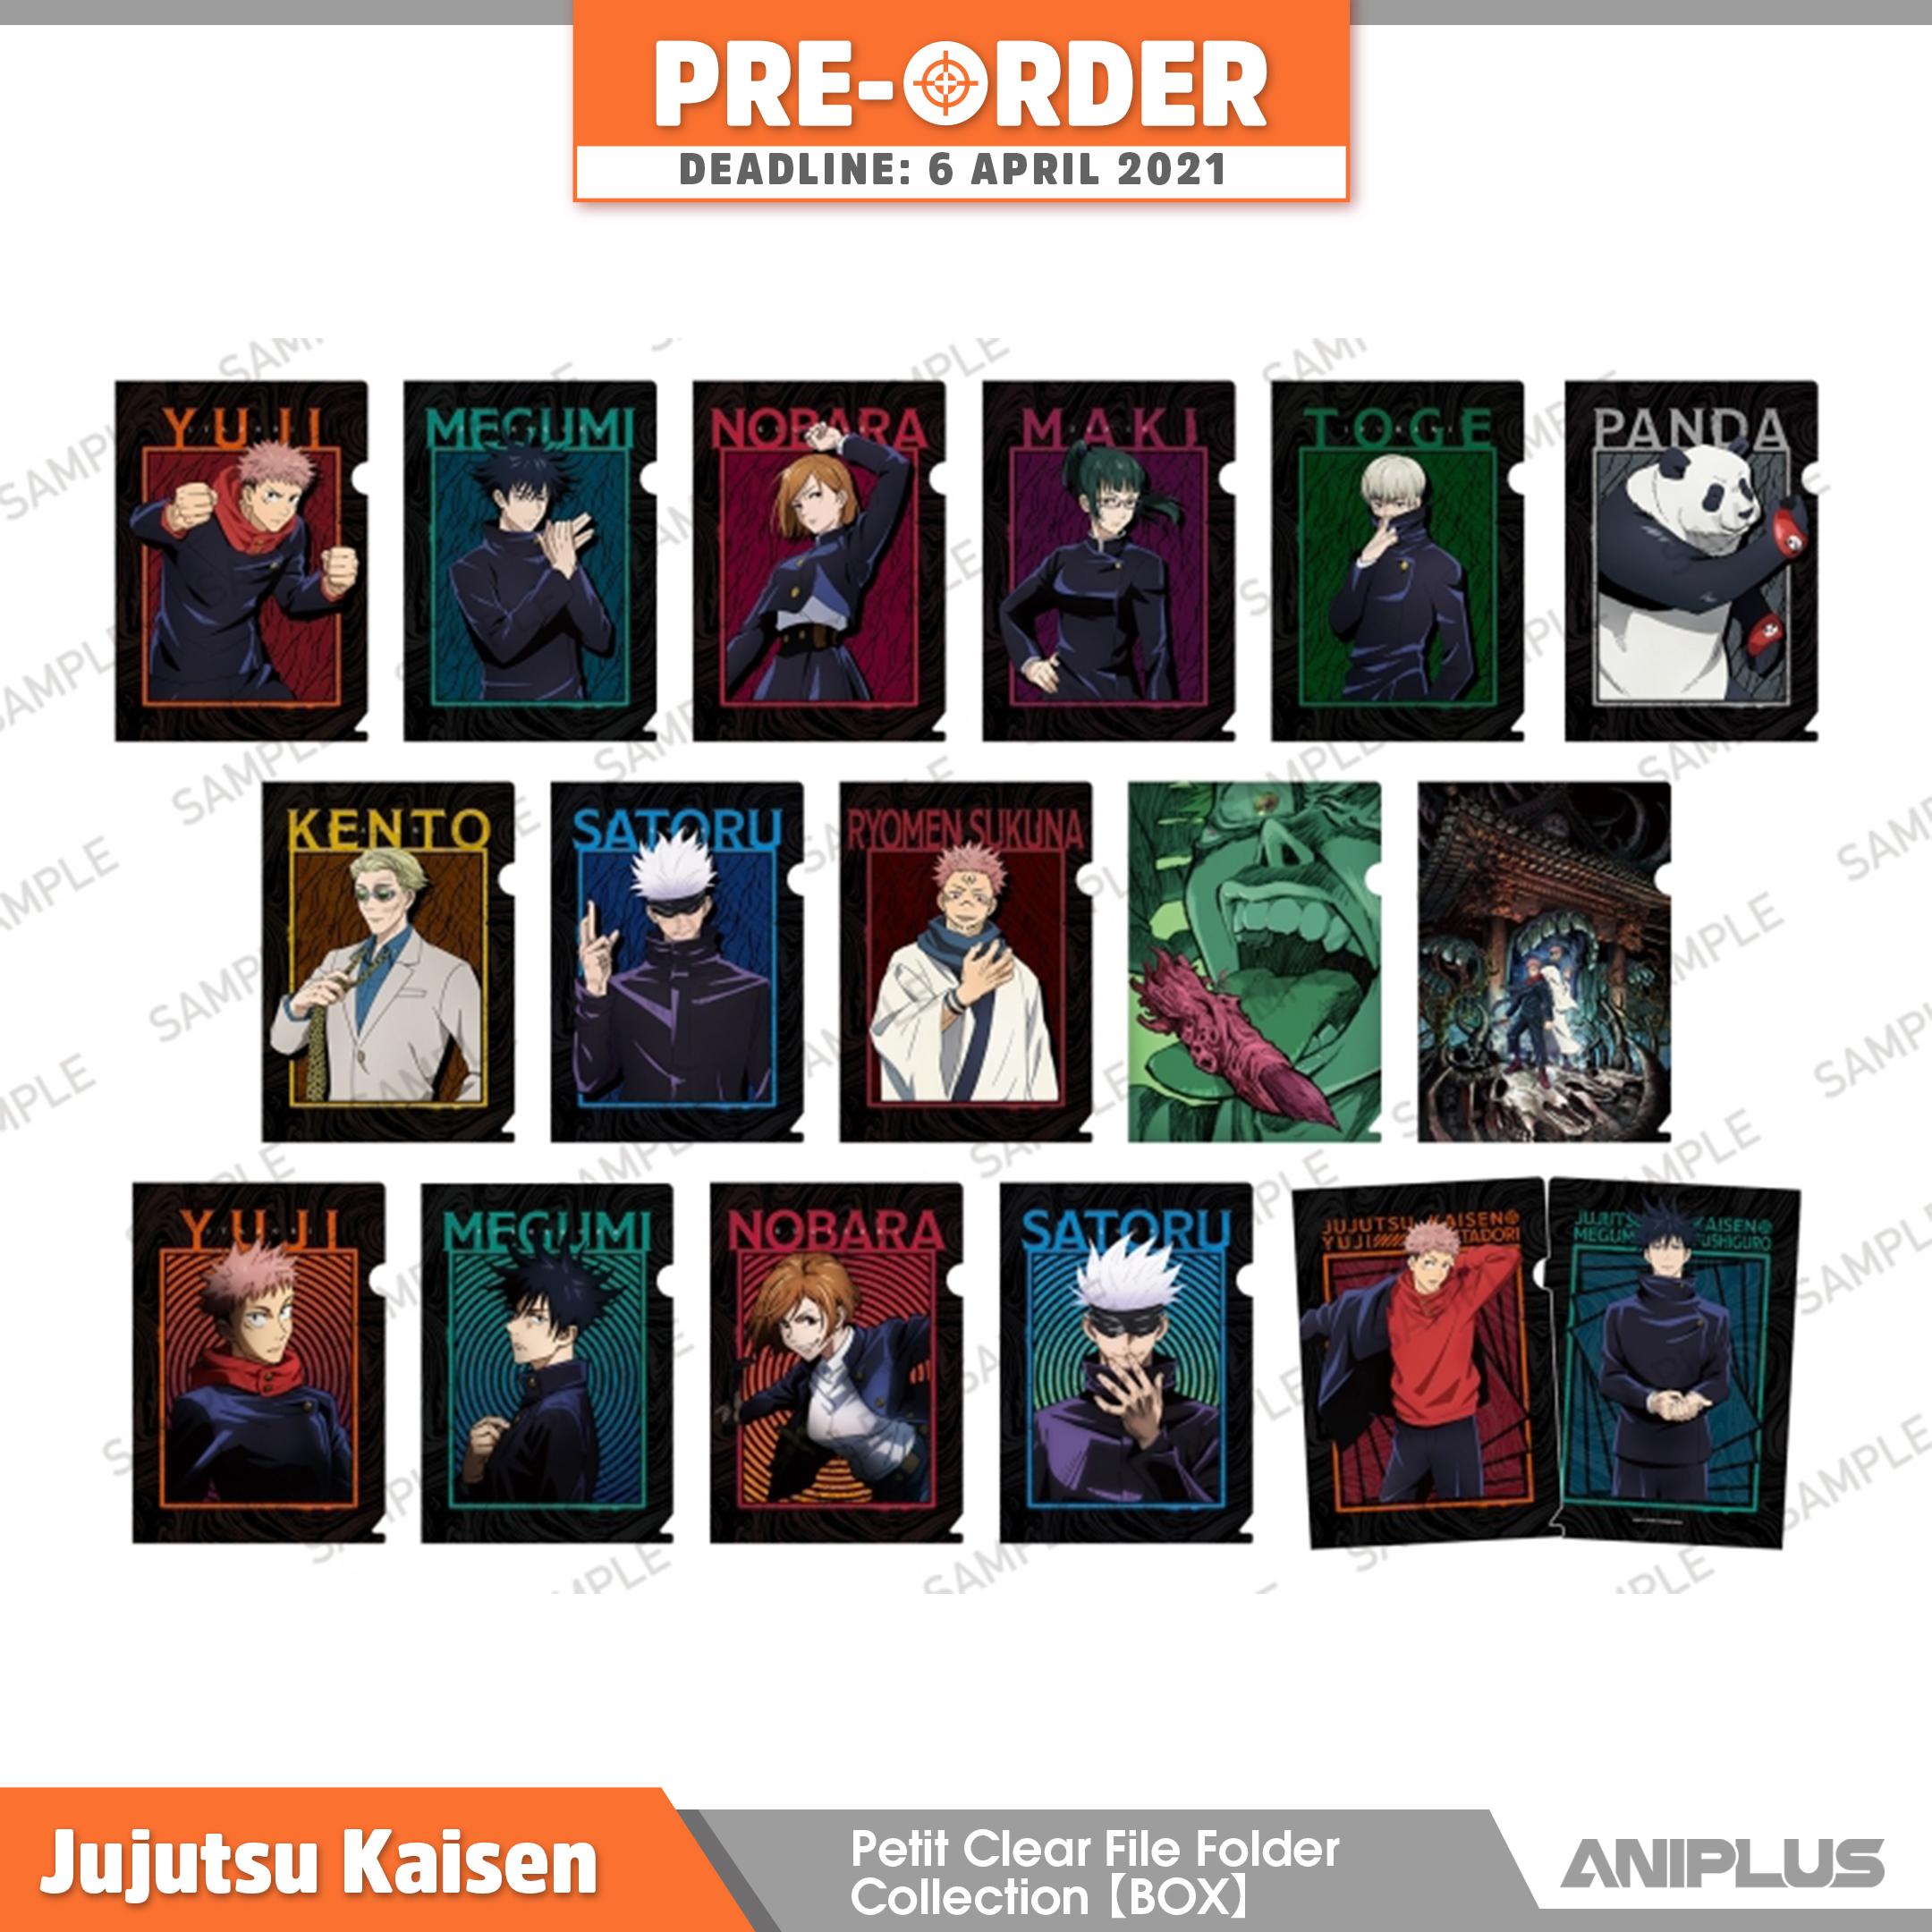 Jujutsu Kaisen Petit Clear File Folder Collection Box